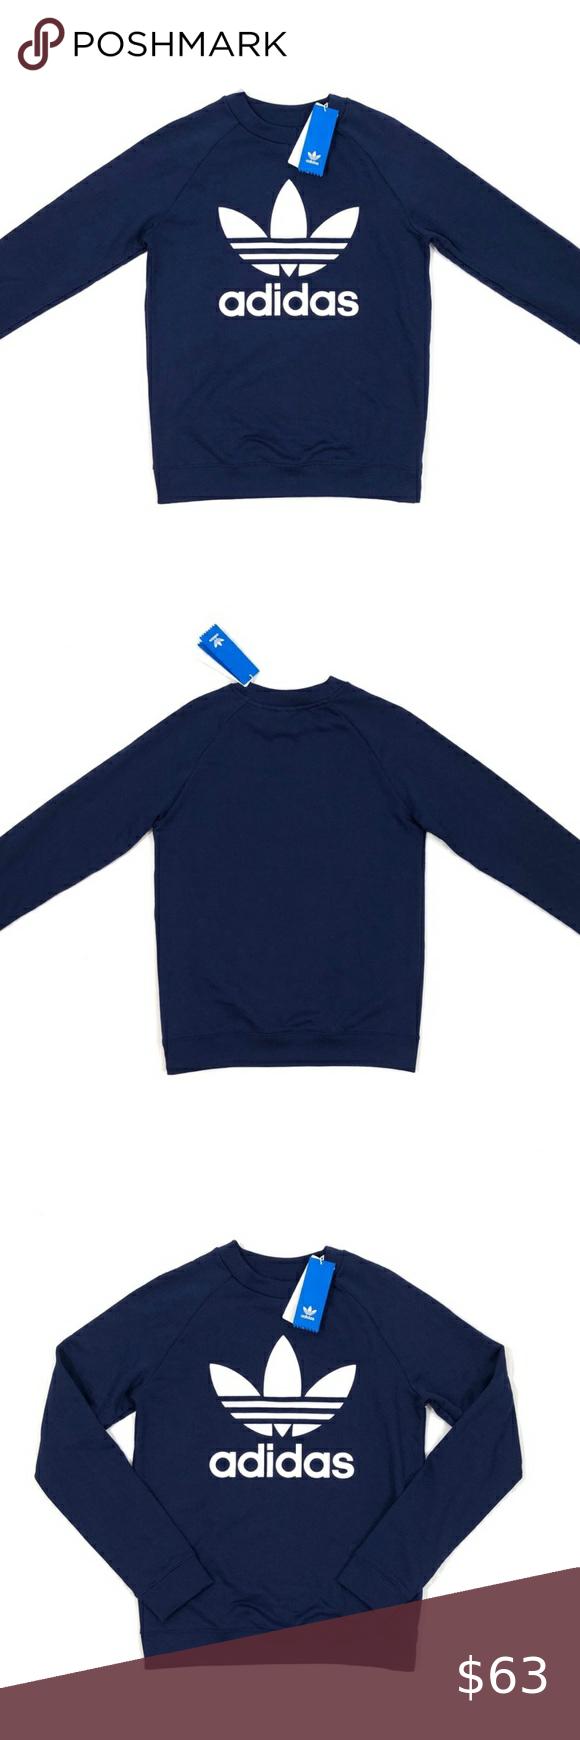 Adidas Originals Trefoil Pullover Sweatshirt Sweatshirts Women Crew Sweatshirts Branded Sweatshirts [ 1740 x 580 Pixel ]